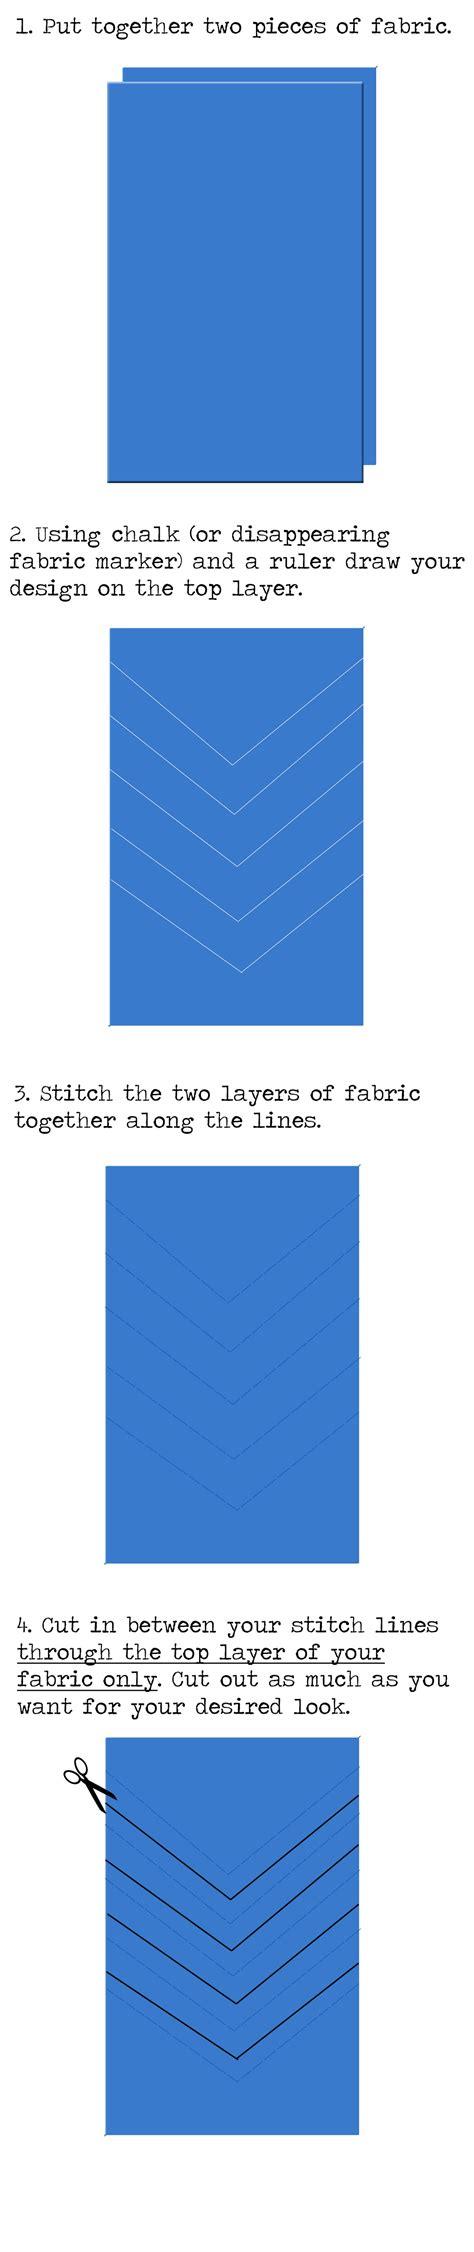 html tutorial notes chelise patterson bias shred skirt tutorial